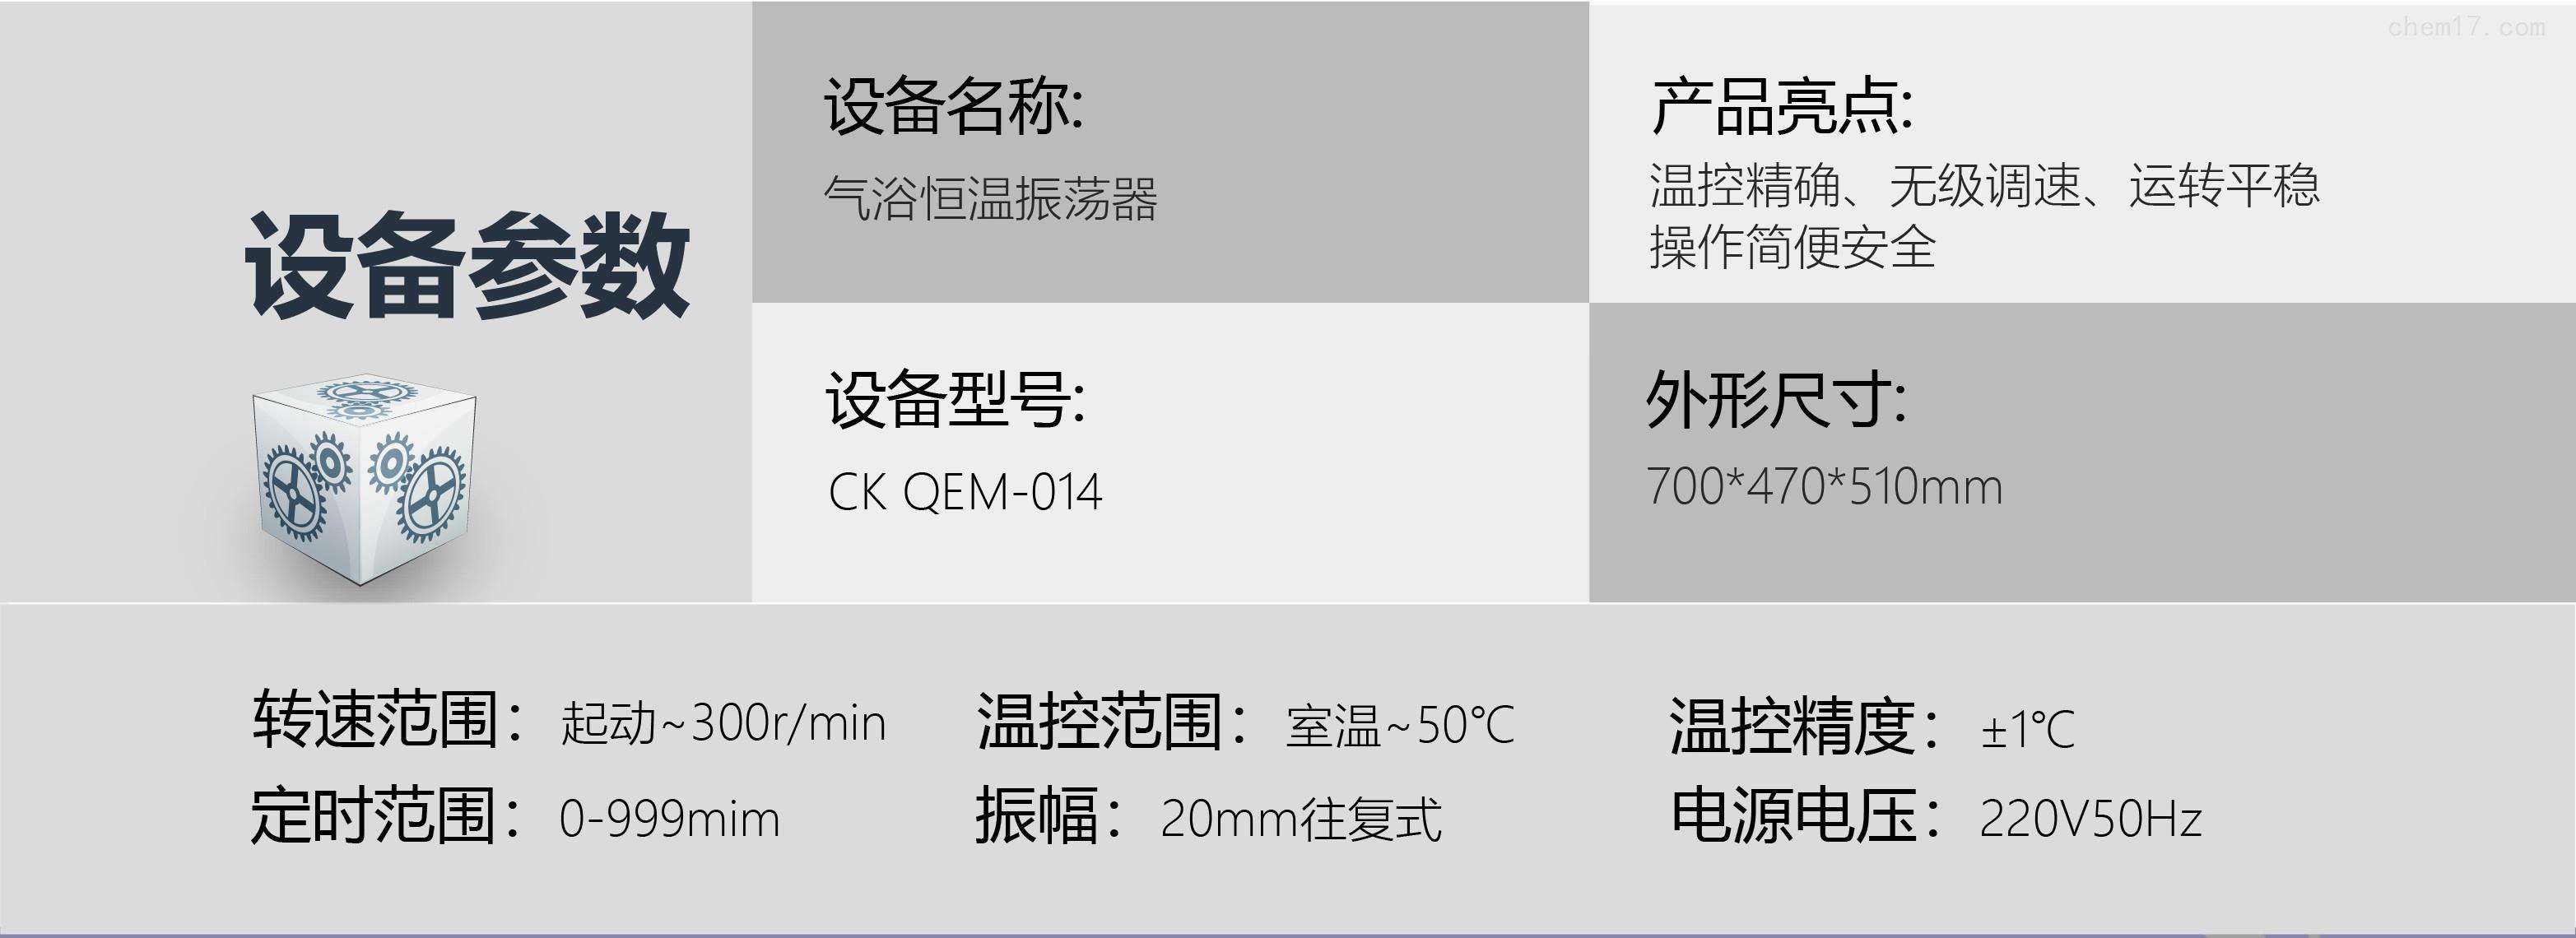 QEM-014设备参数.jpg